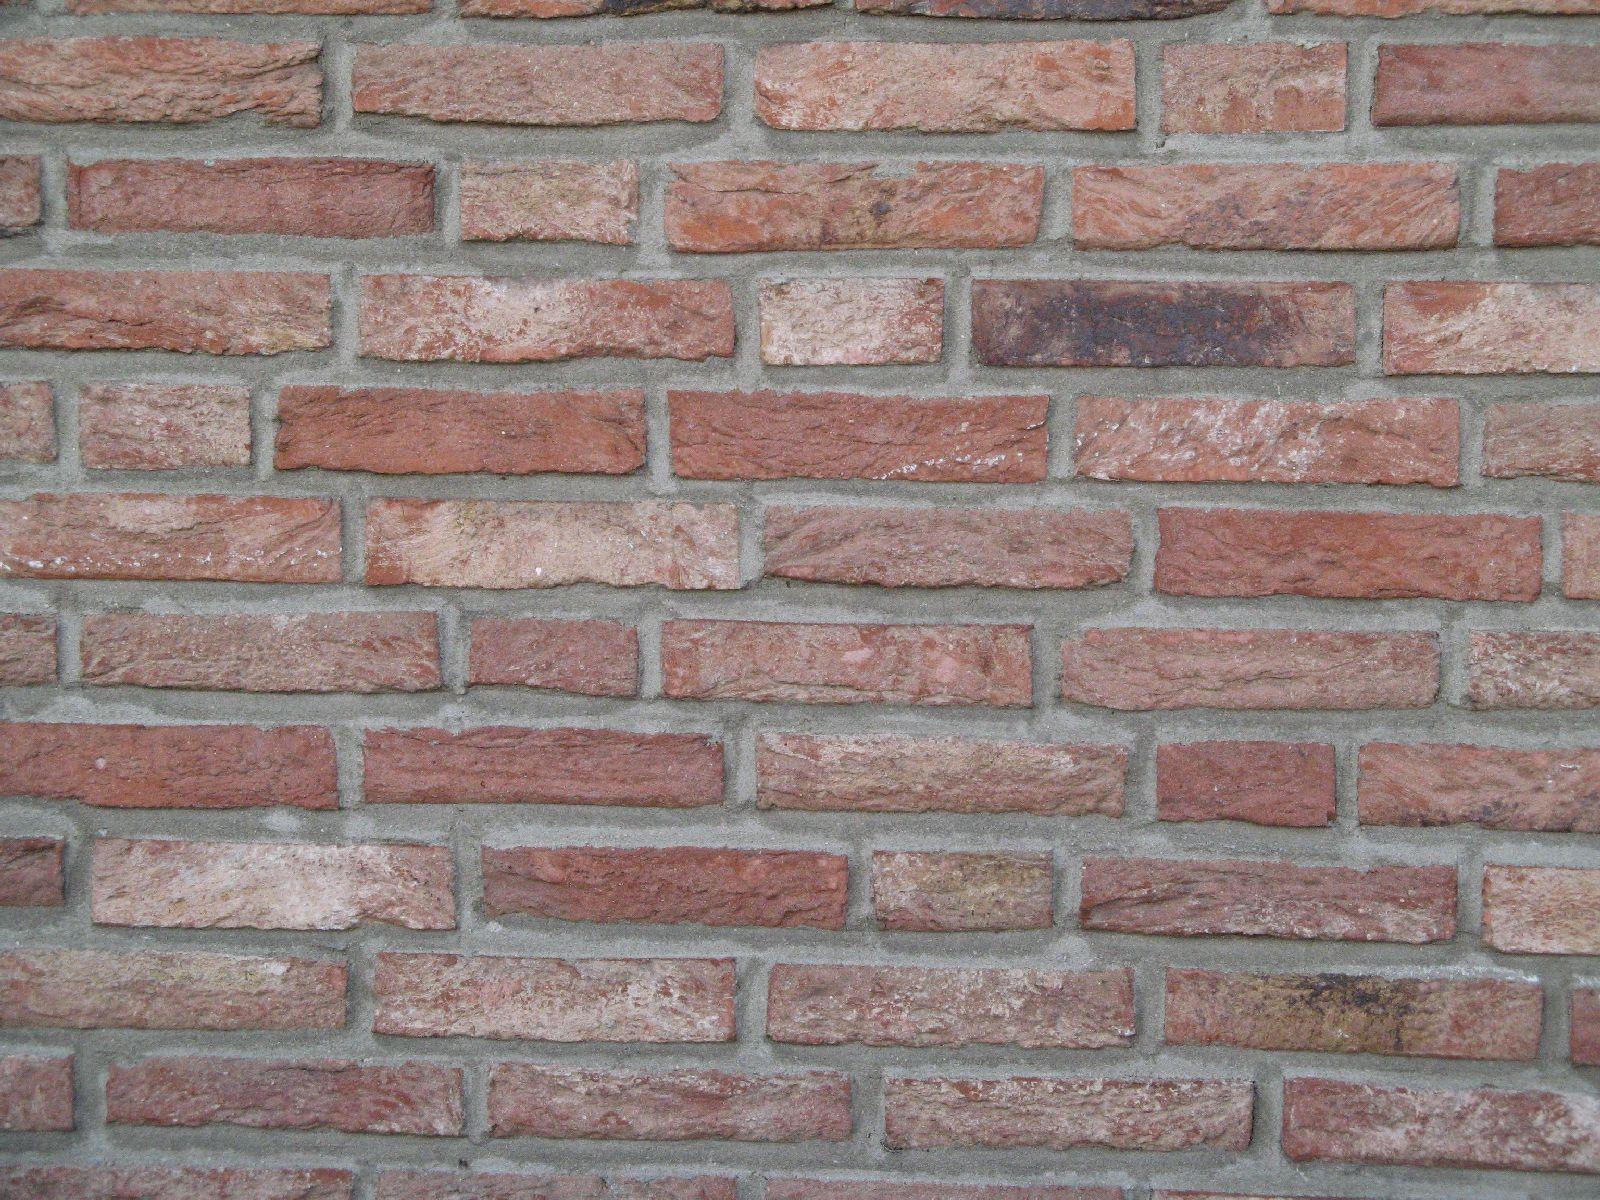 Brick_Texture_B_5765